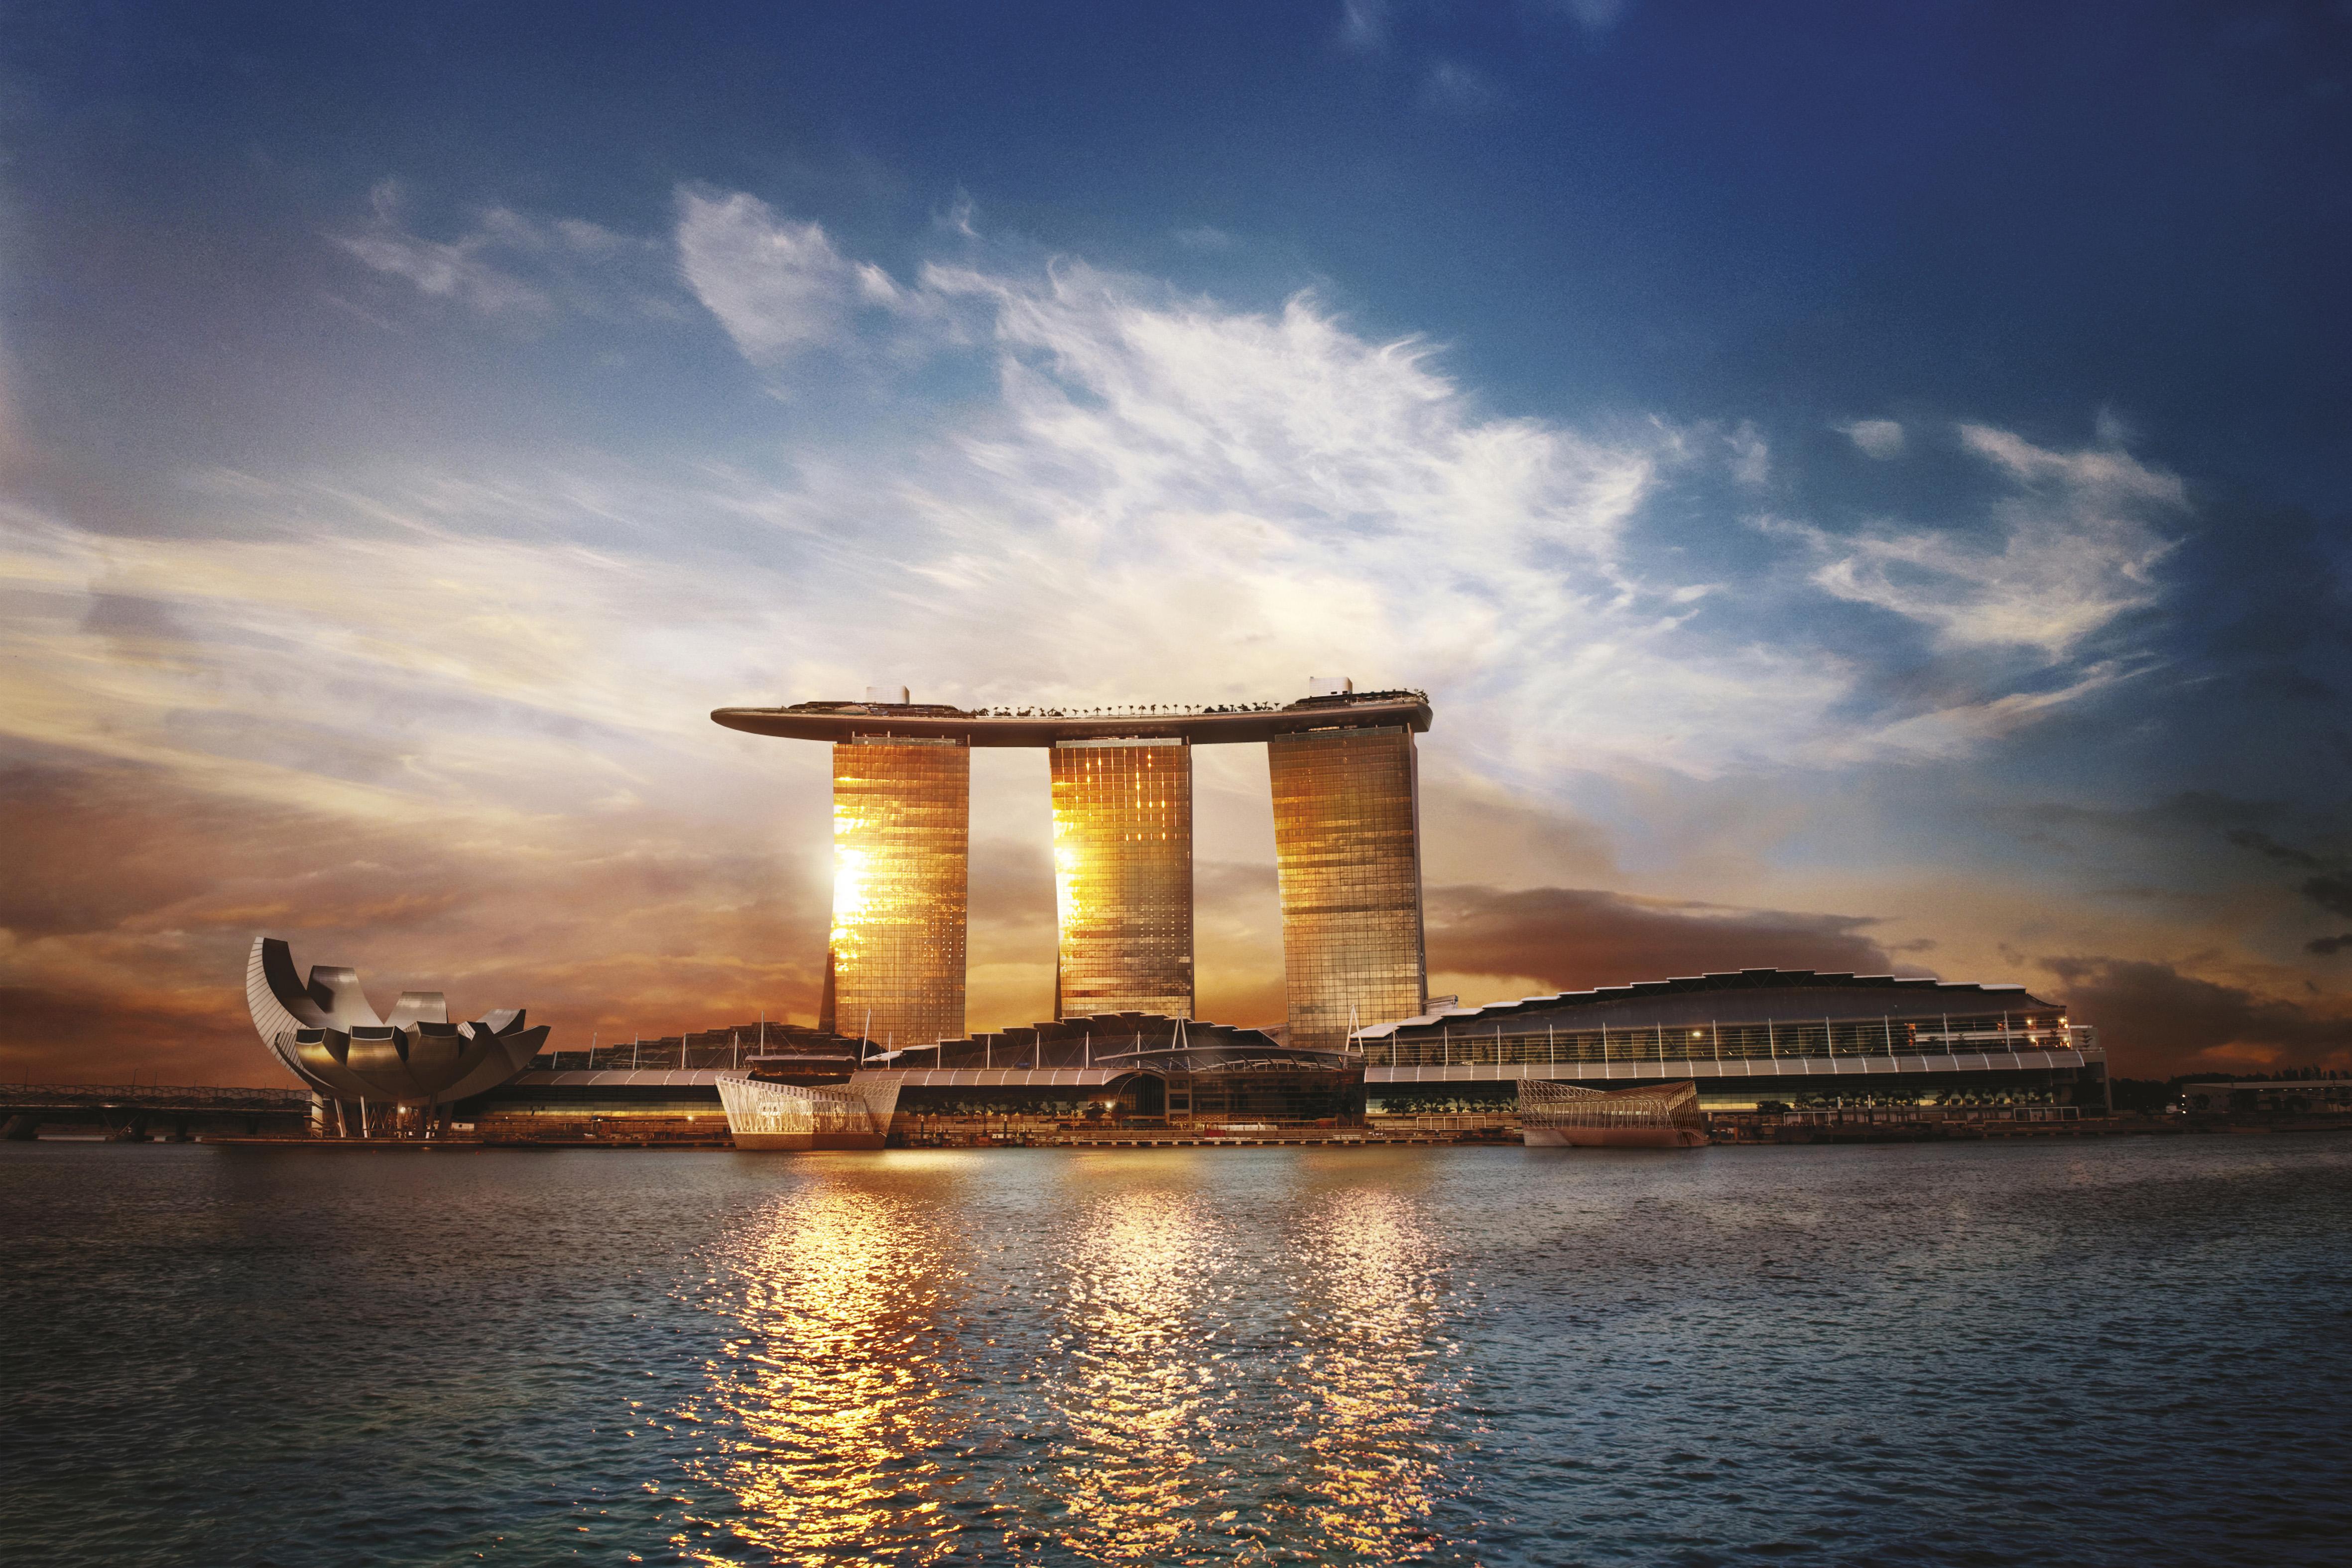 Marina Bay Sands from the sea.